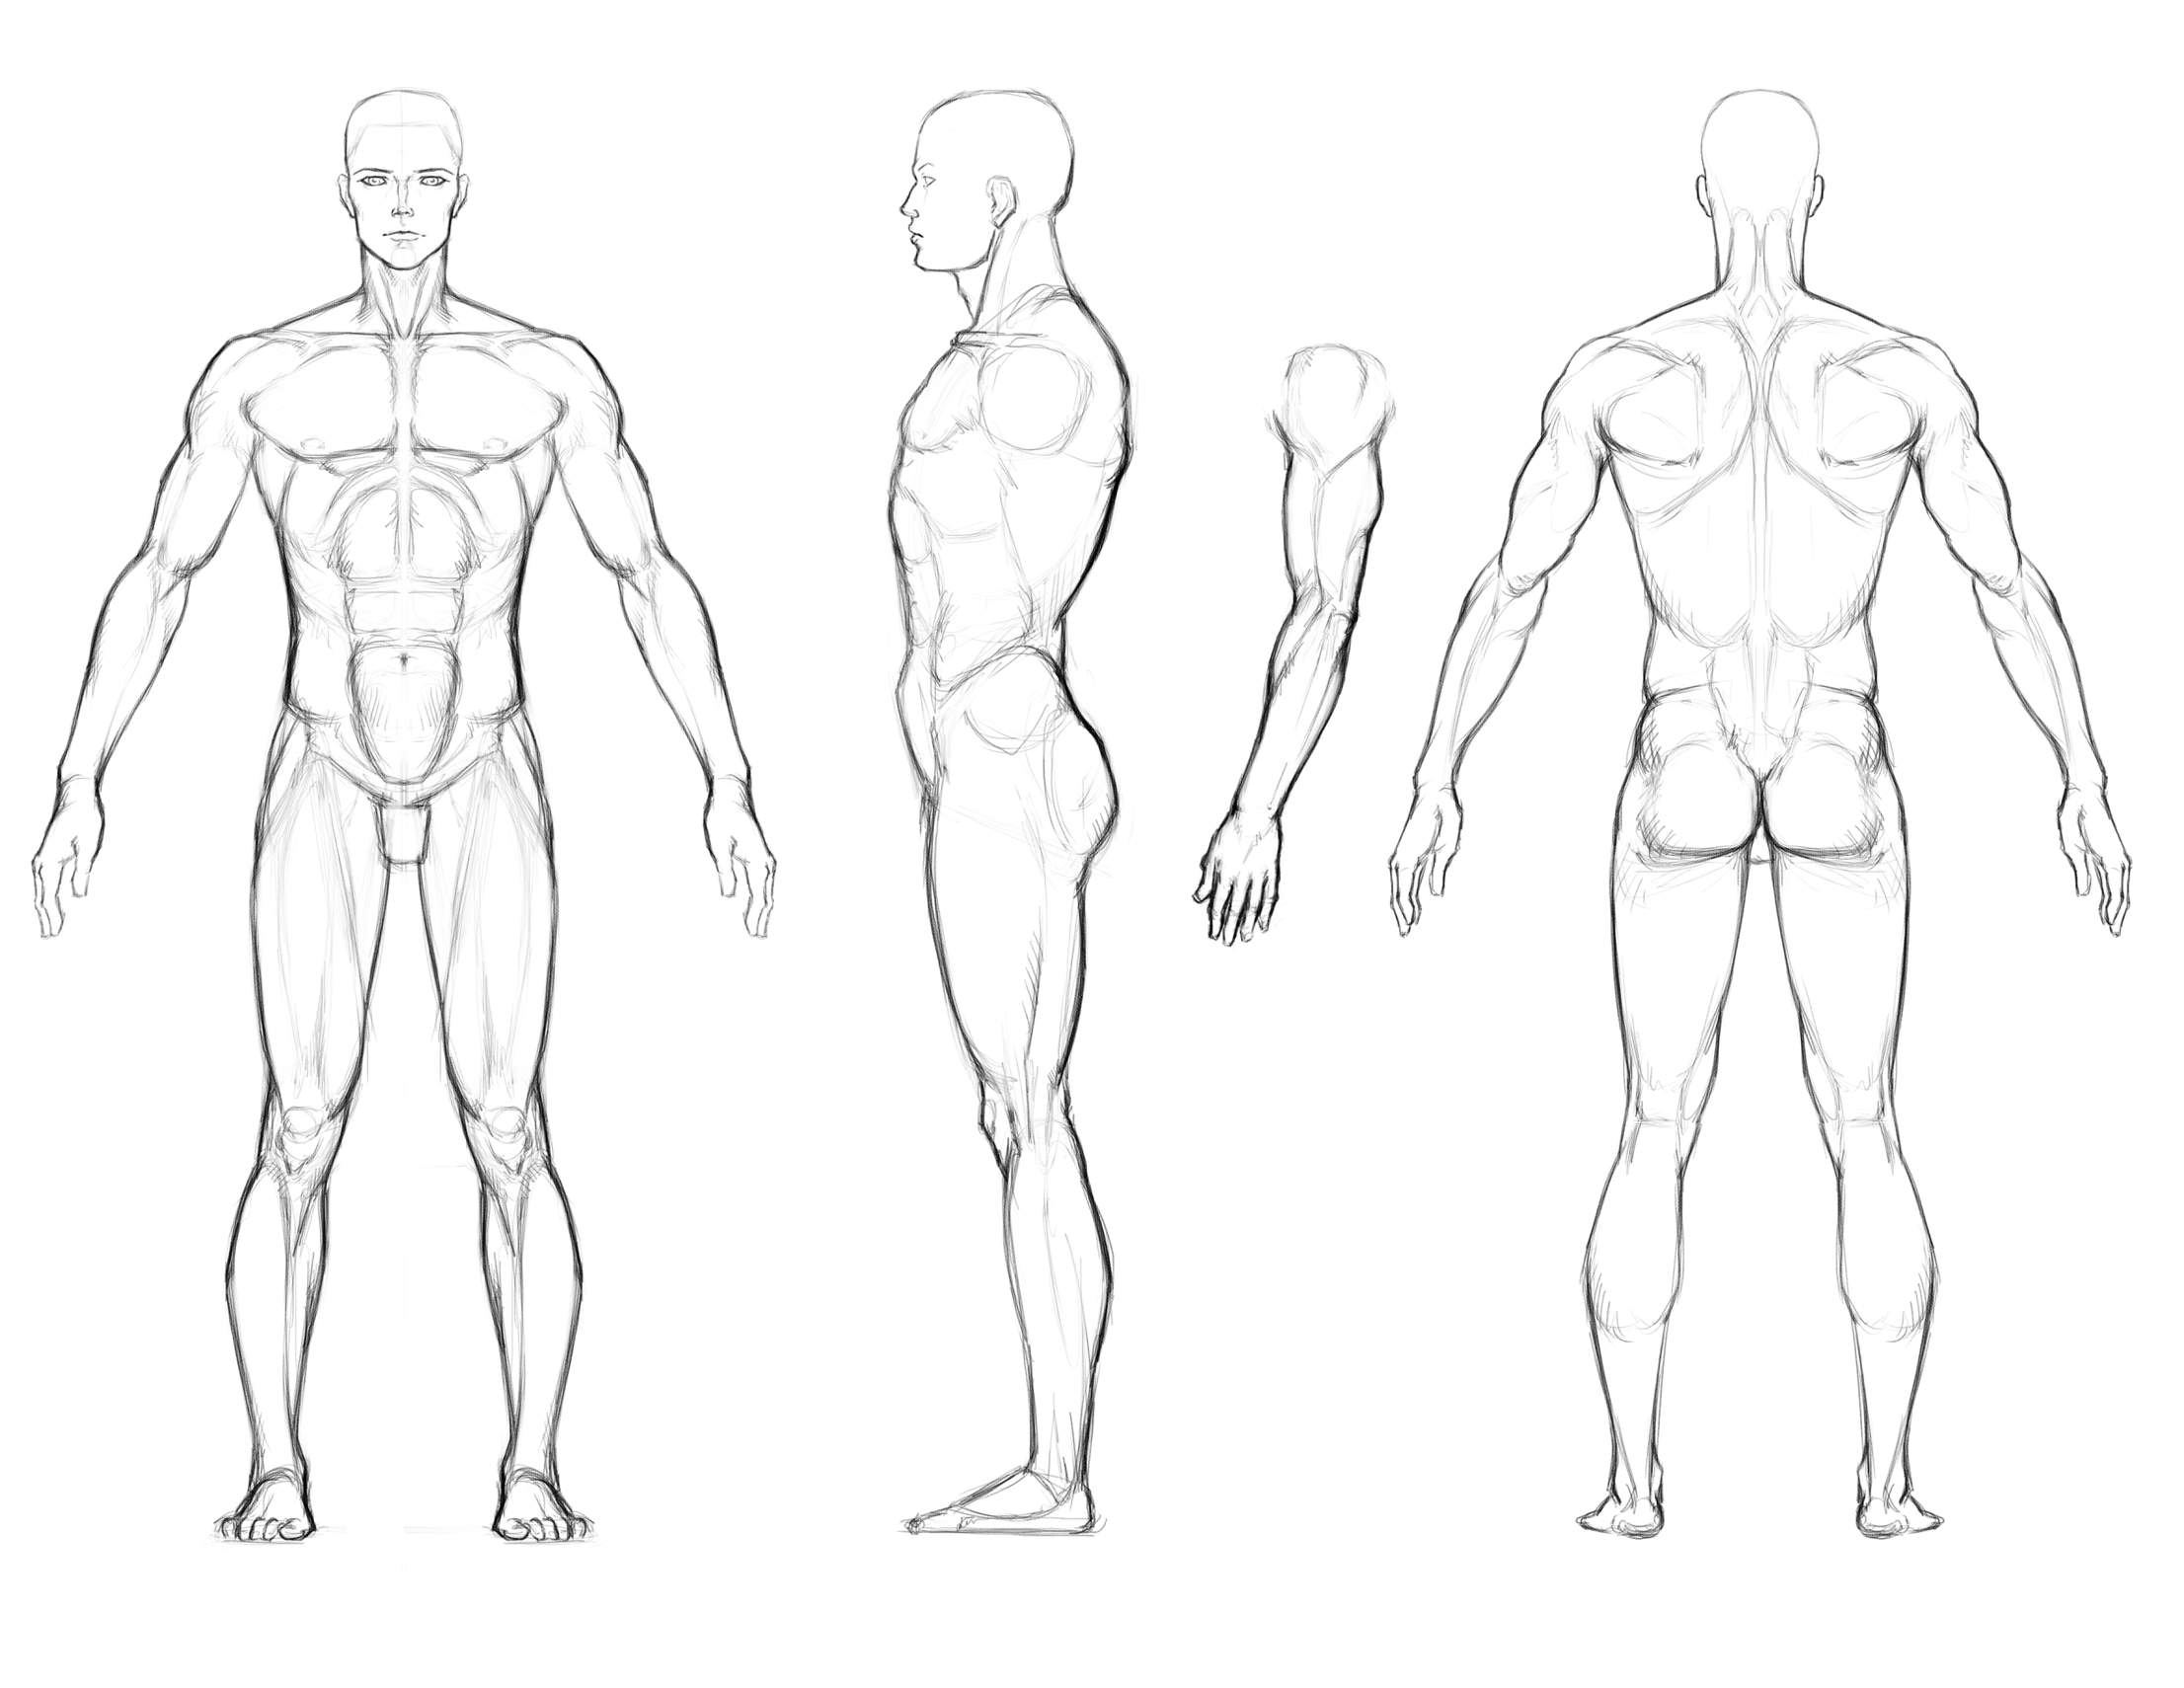 Photobucket Naked Stunning art reference. turnaround sheet. muscular man drawing photobucket